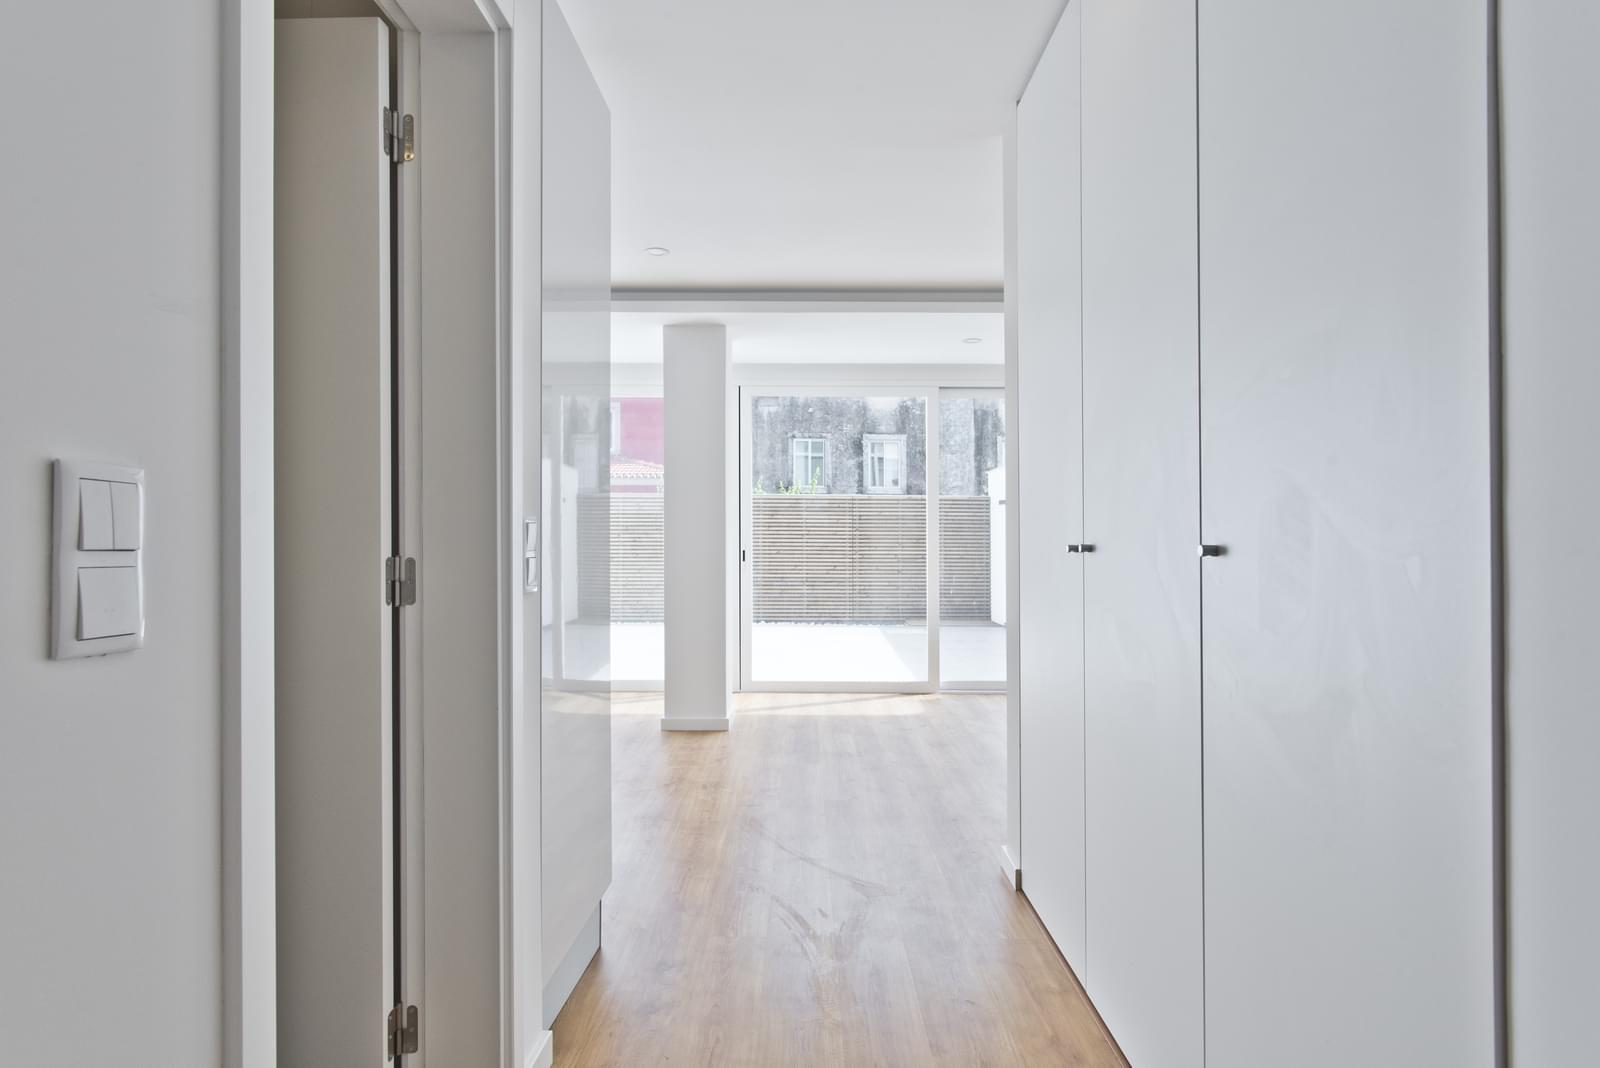 pf16986-apartamento-t2-cascais-3c4fbd16-d5e6-419f-ac84-058b28602fa7